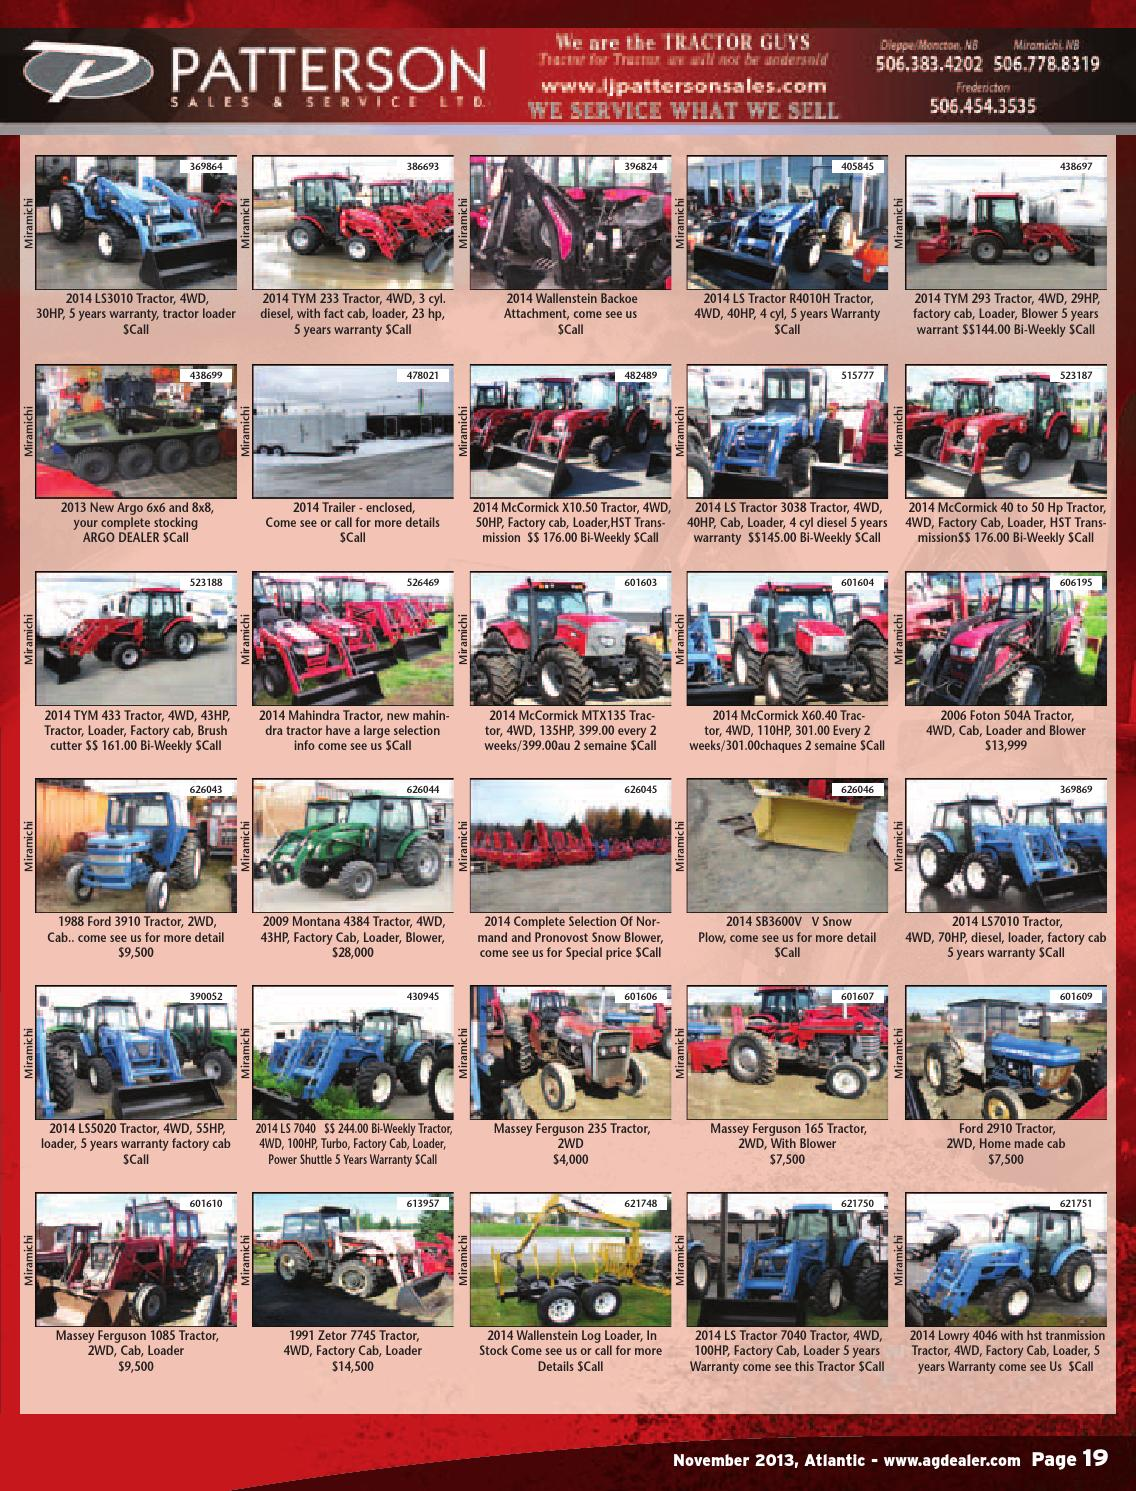 AGDealer Atlantic Edition, November 2013 by Farm Business